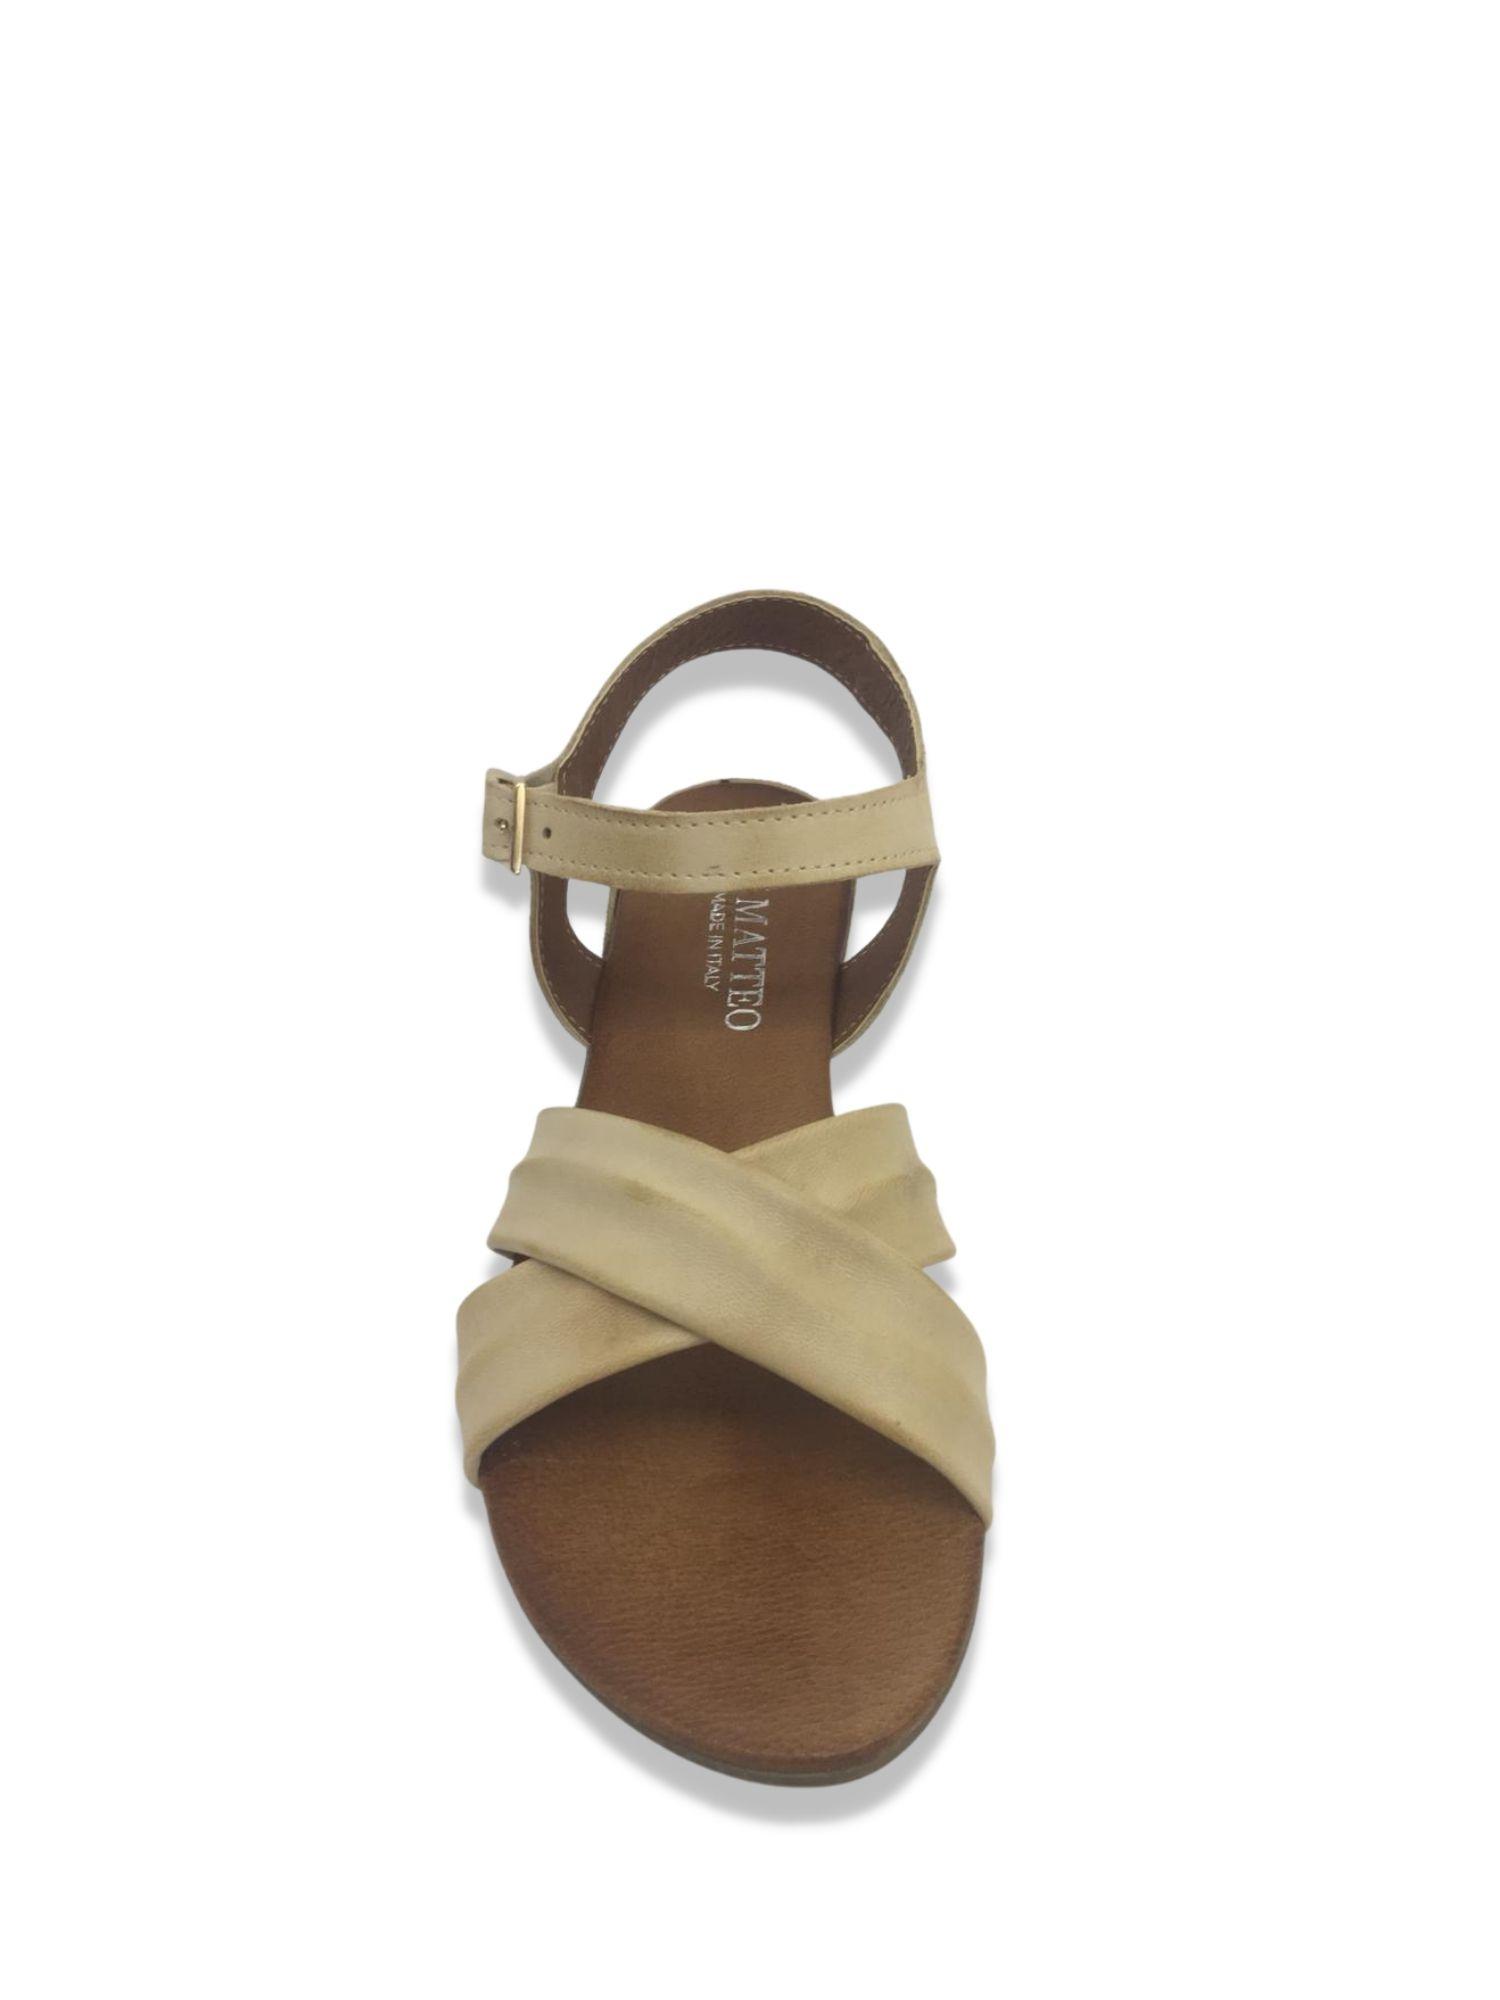 Sandalo Made in Italy 204 Beige alto